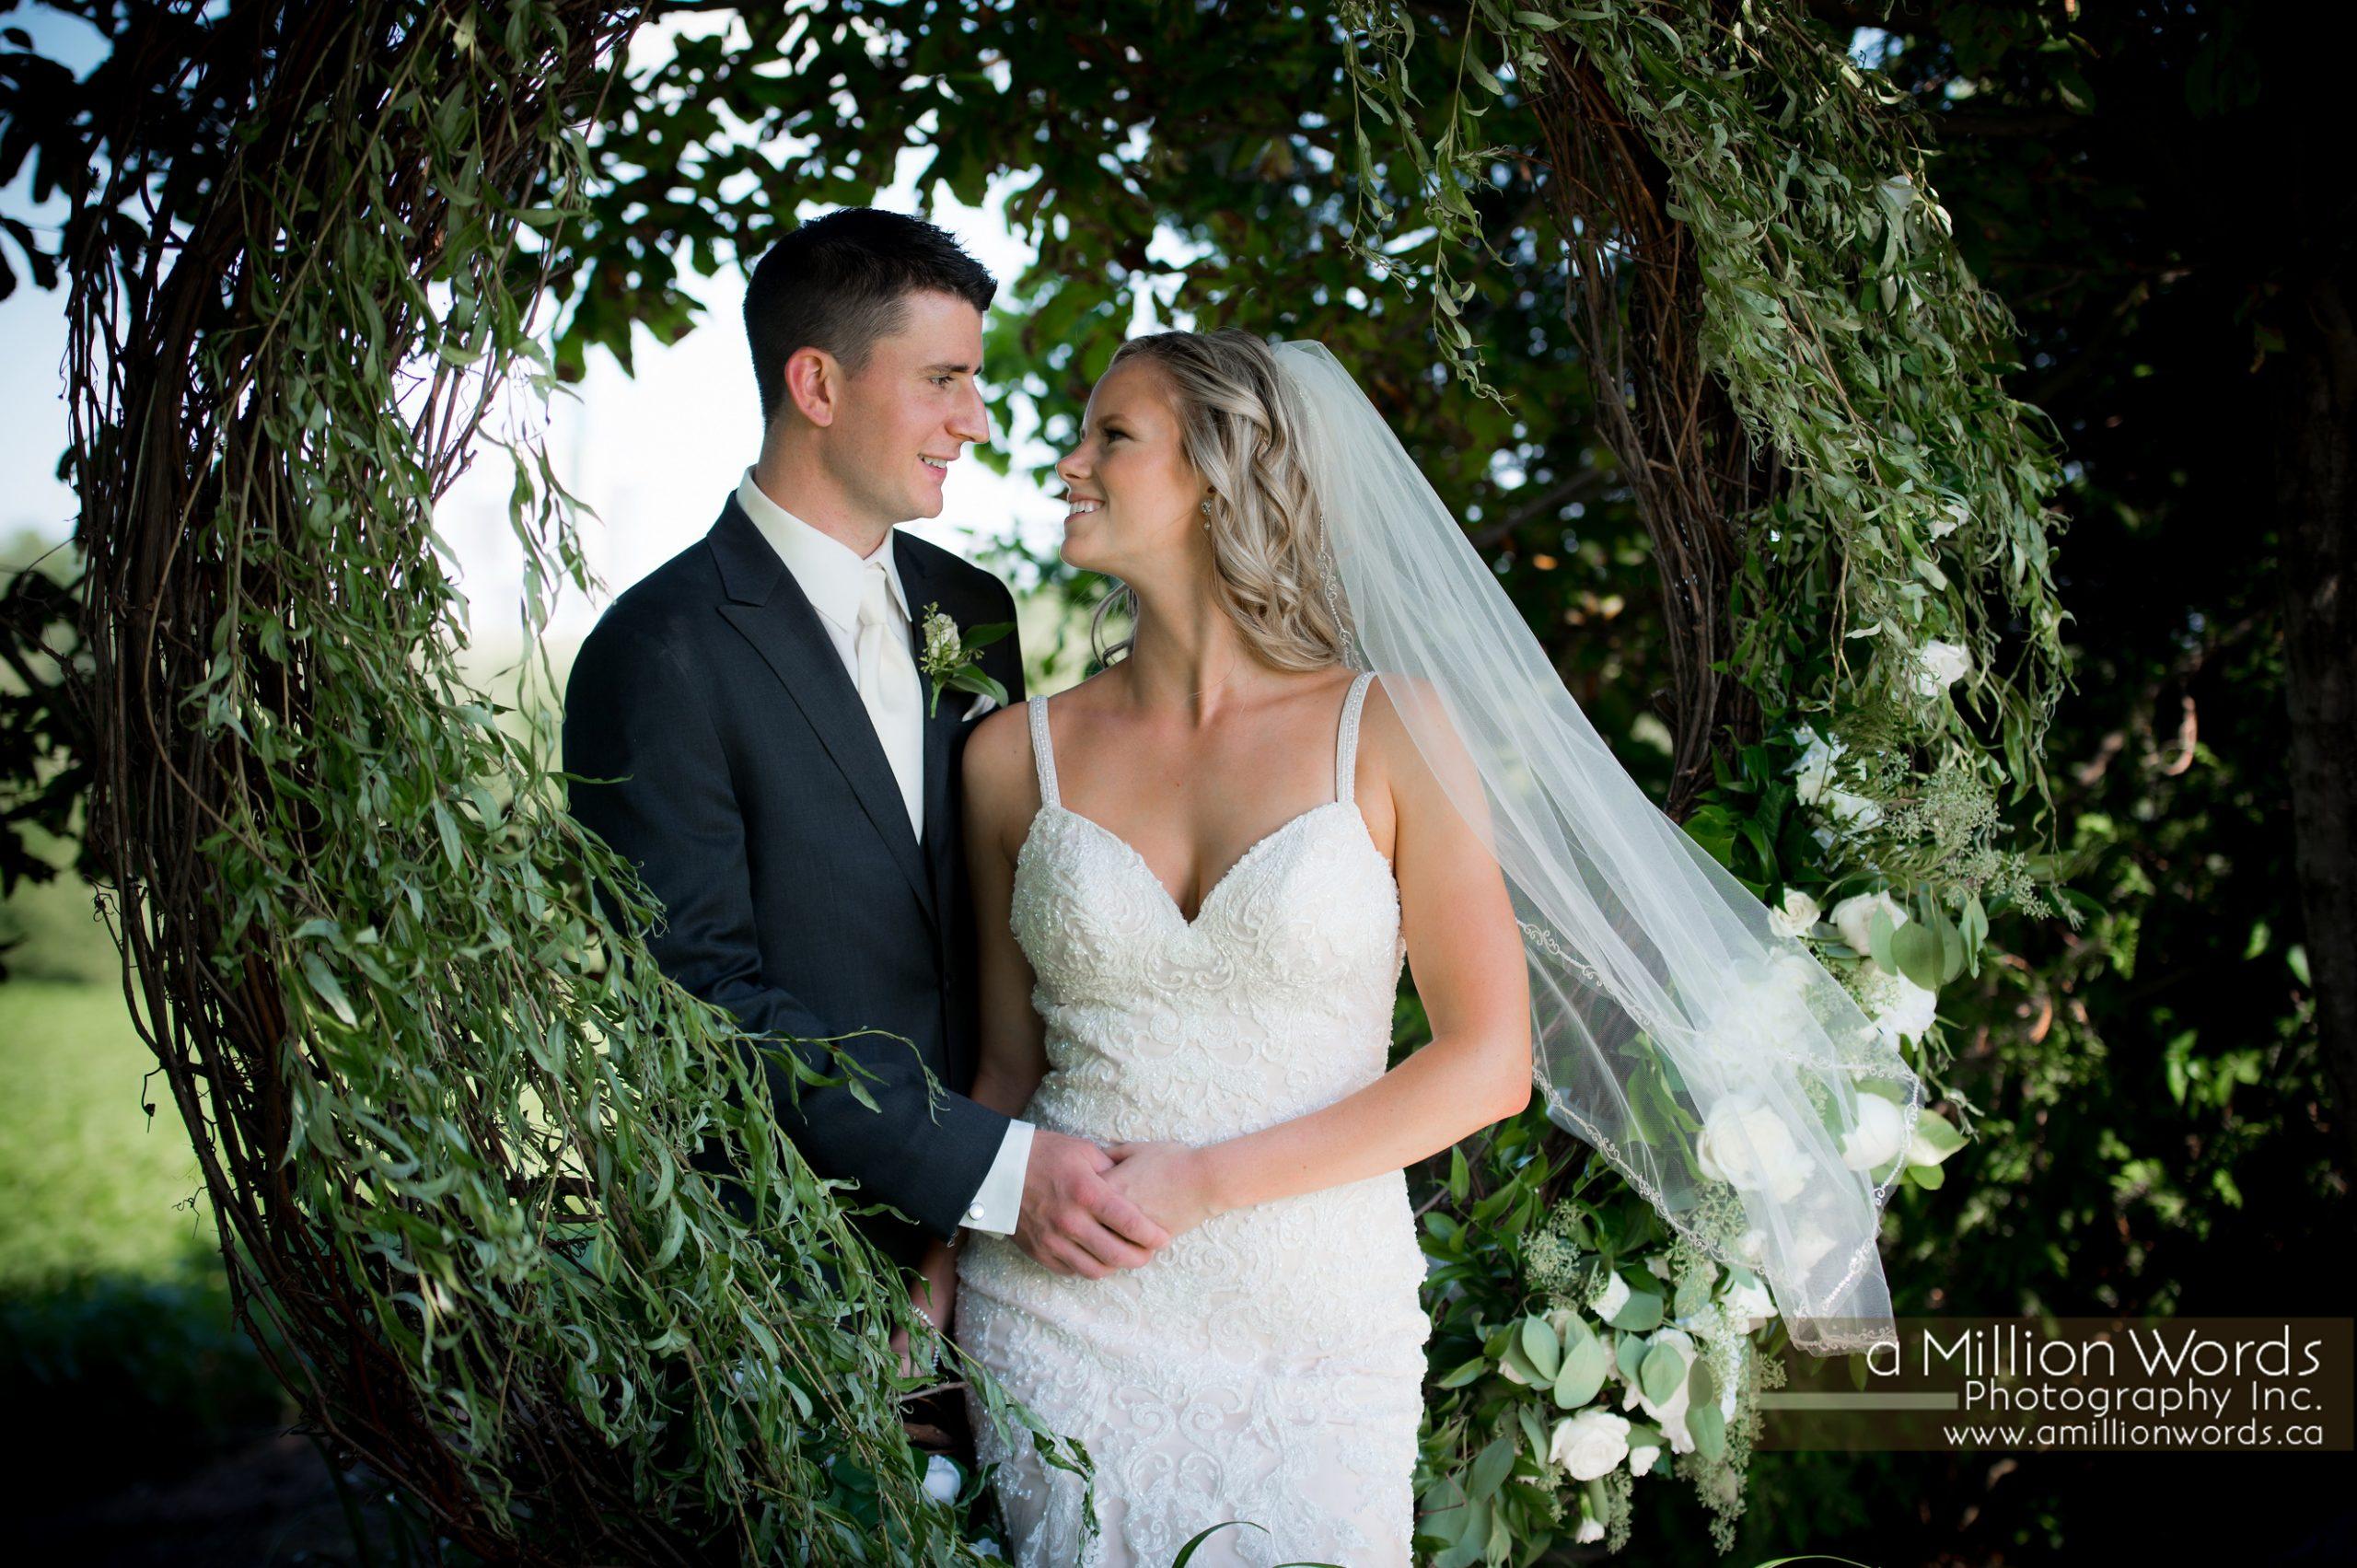 arthur_wedding_photographer44